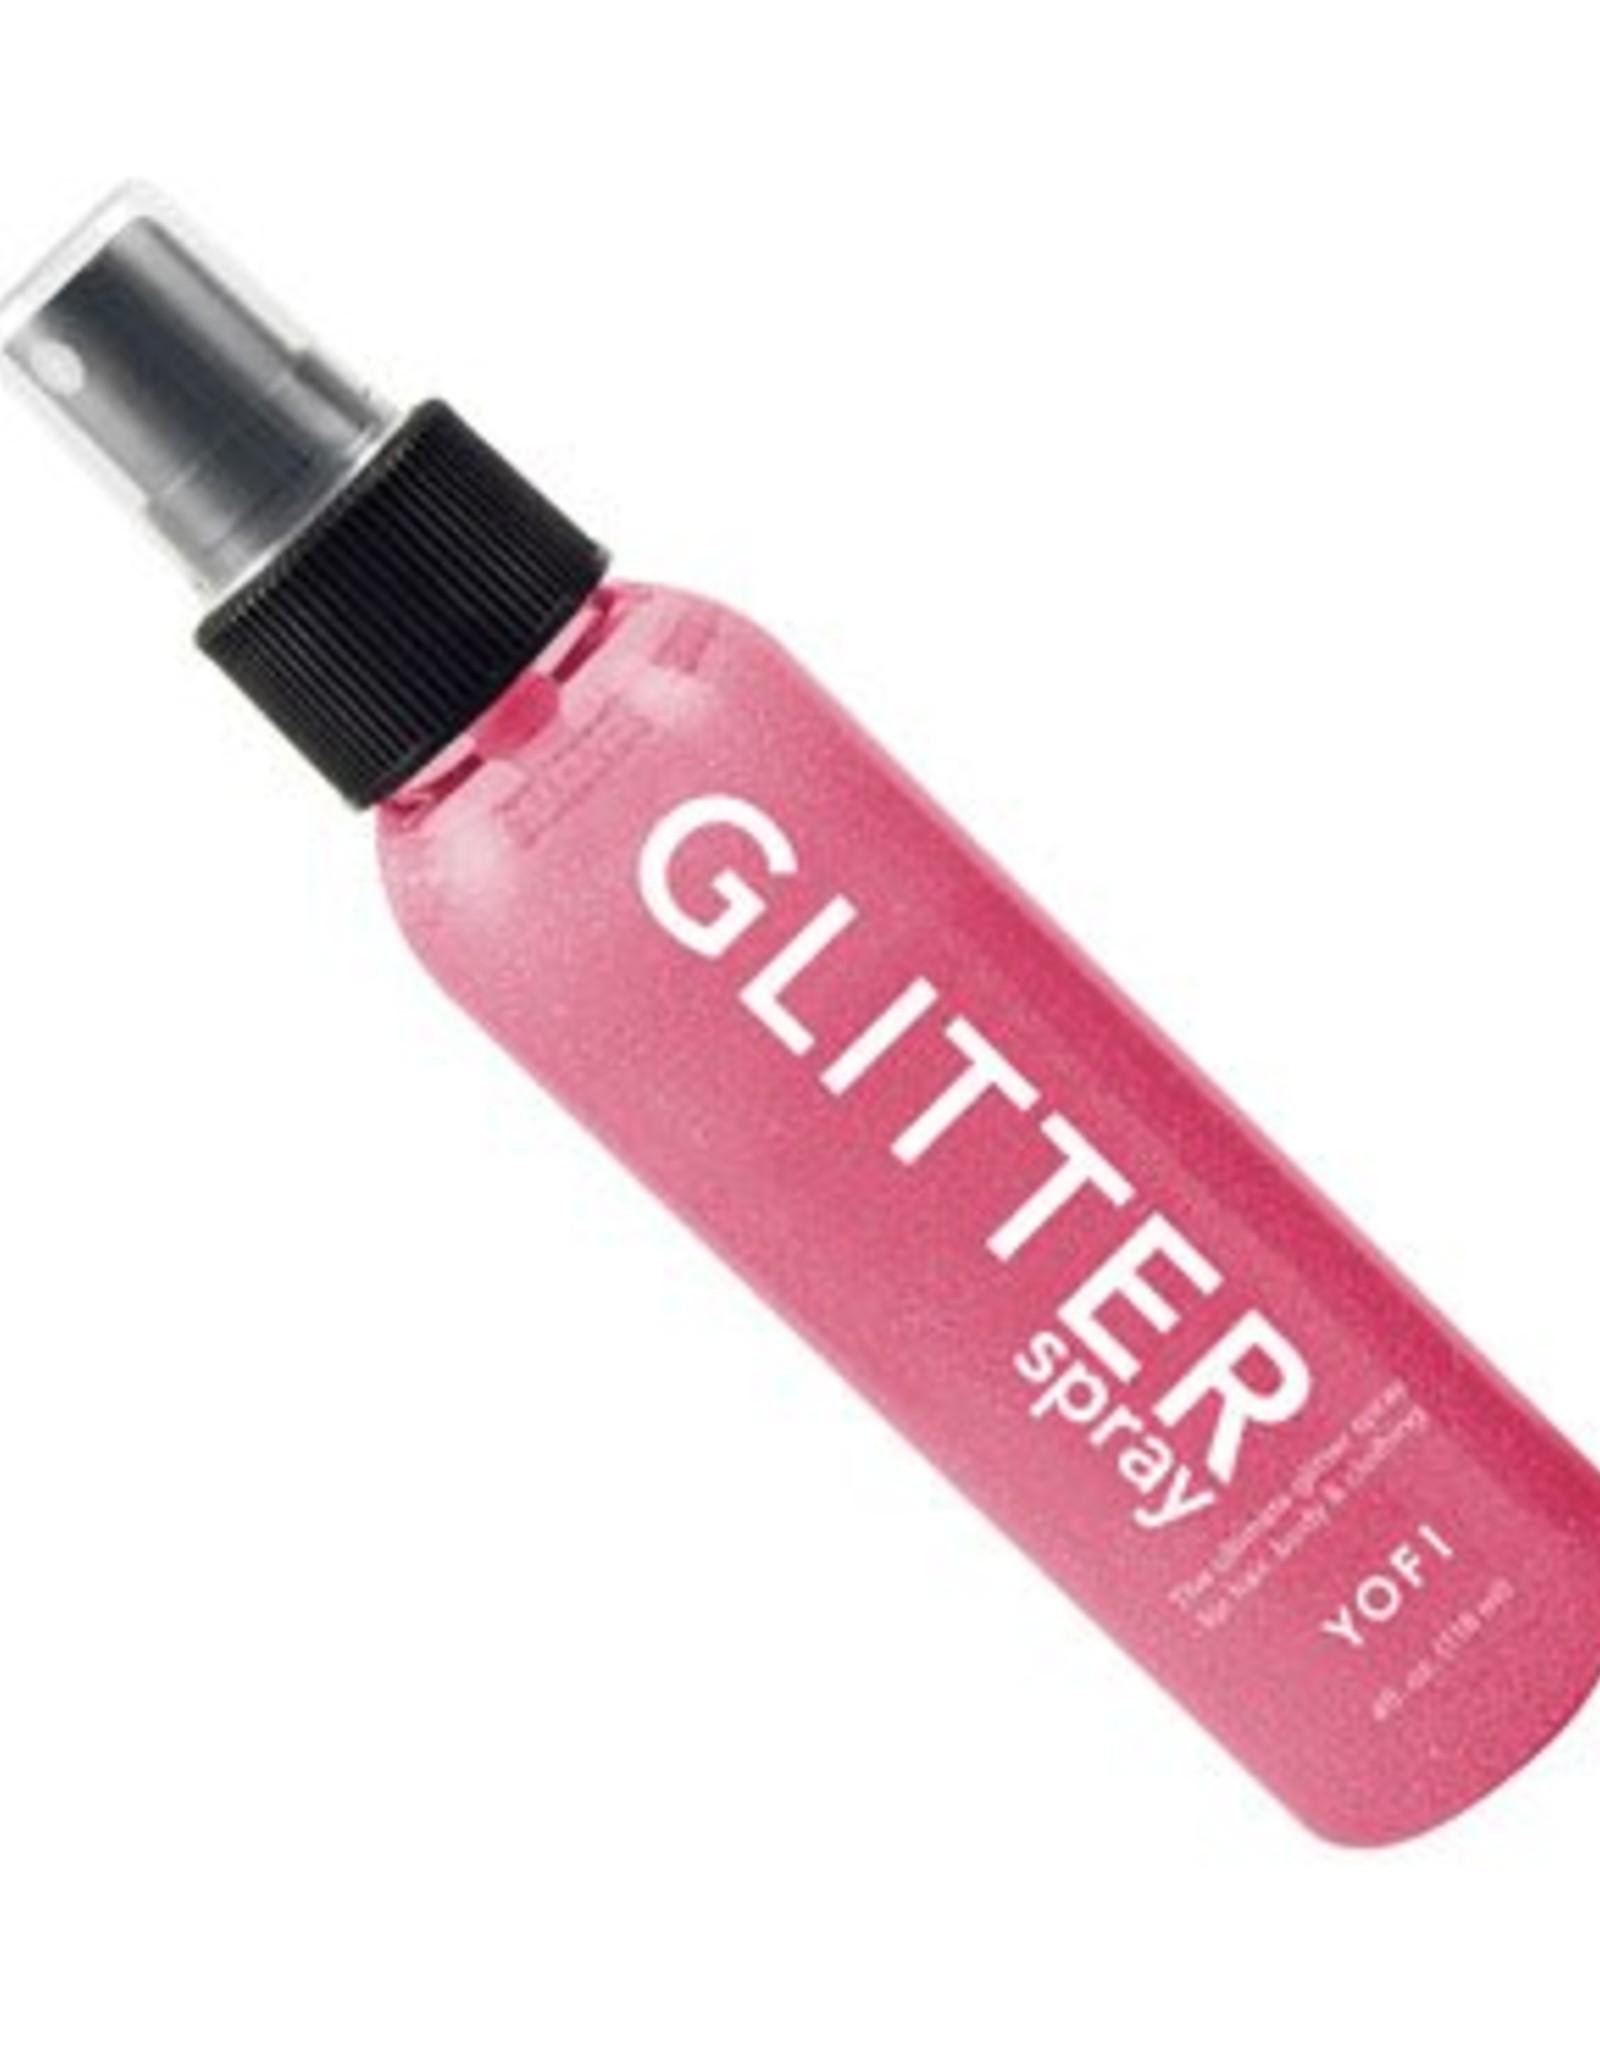 Yofi Glitter Spray